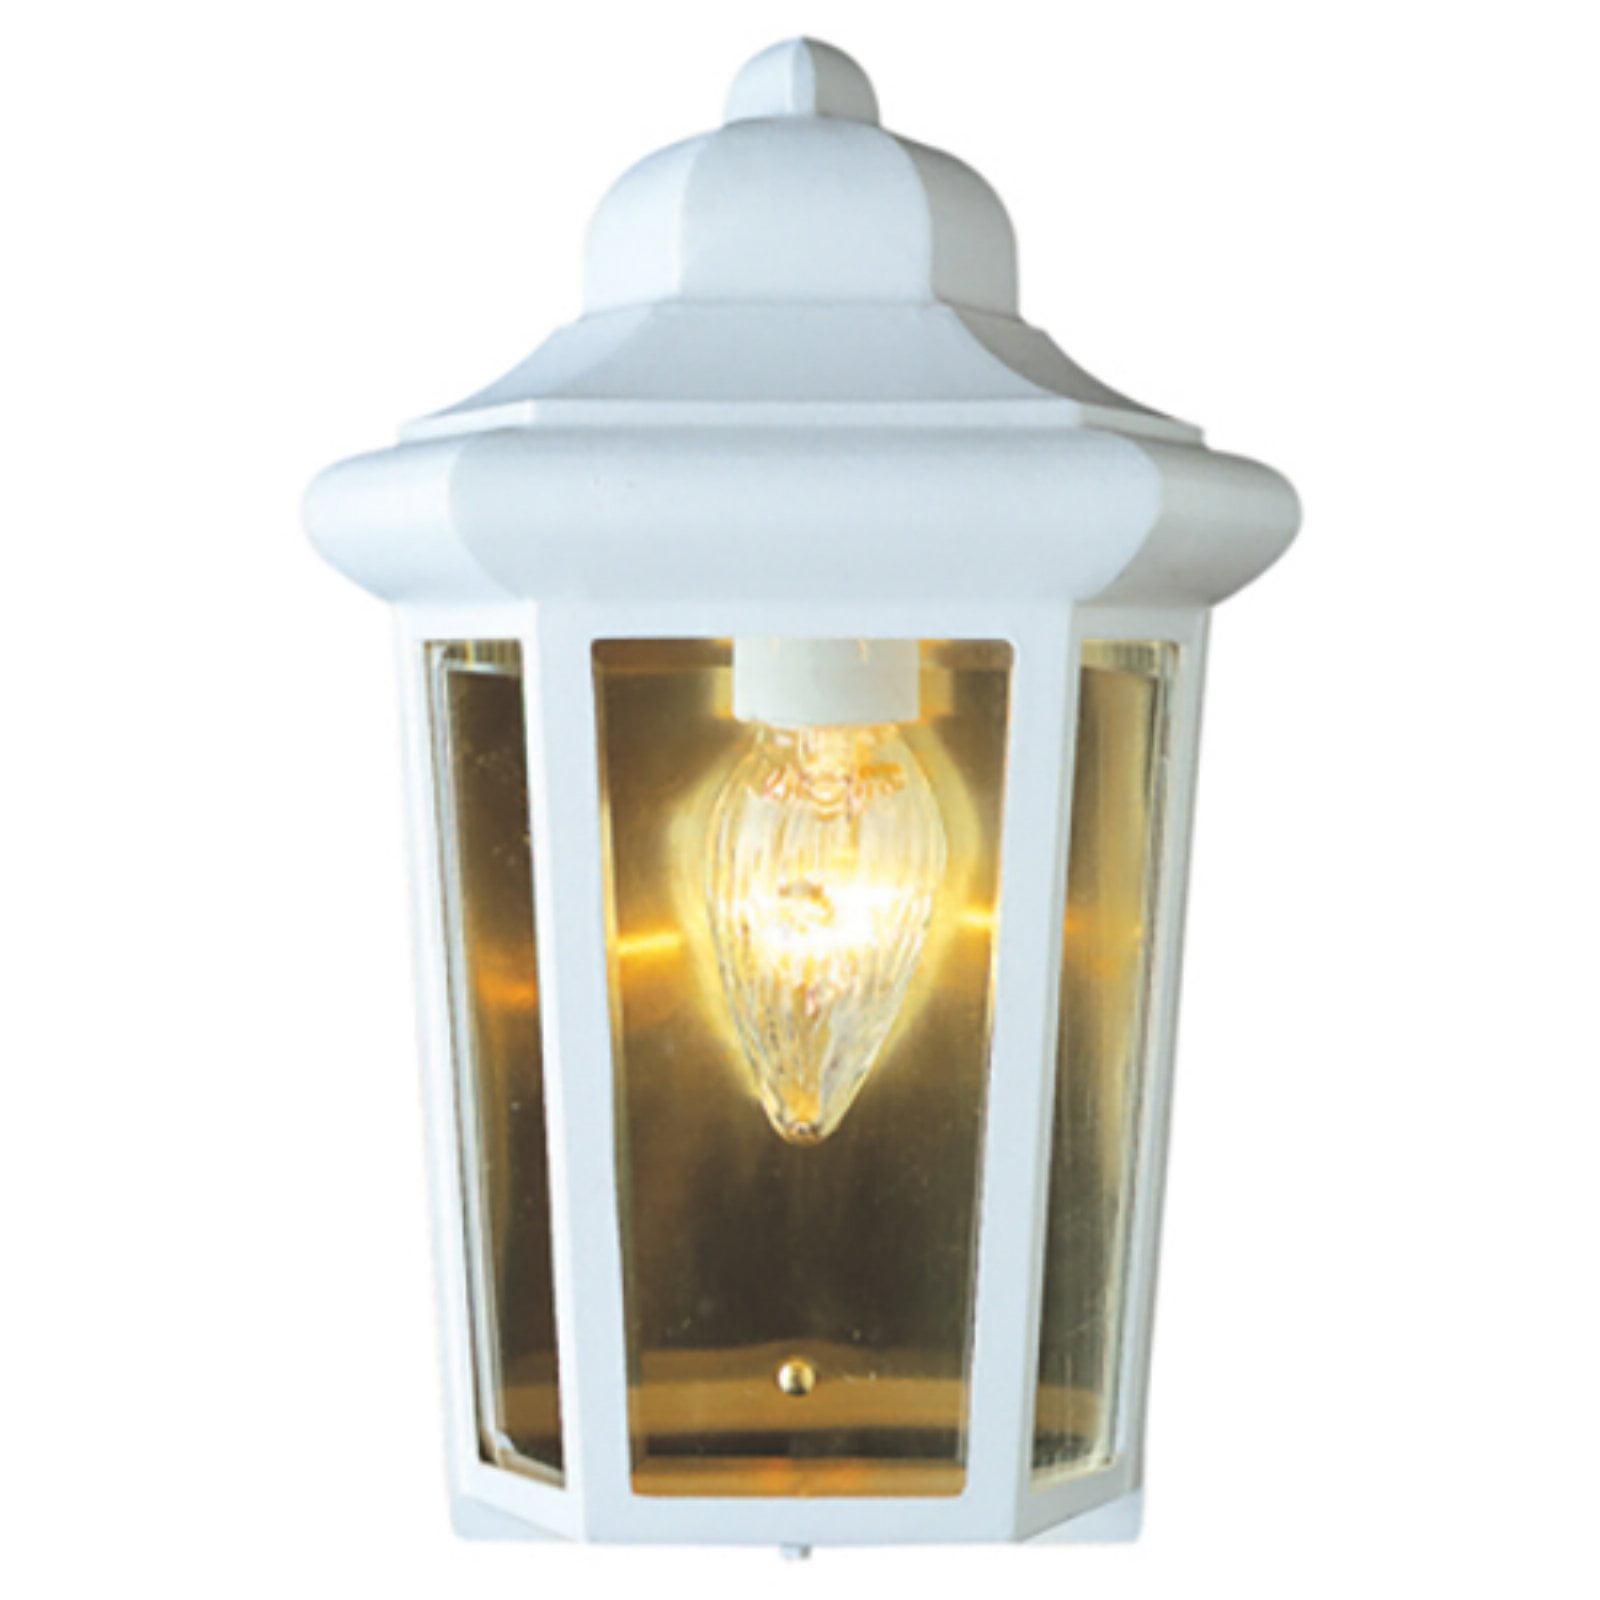 Trans Globe Lighting Rendell 4483 WH Outdoor Pocket Lantern